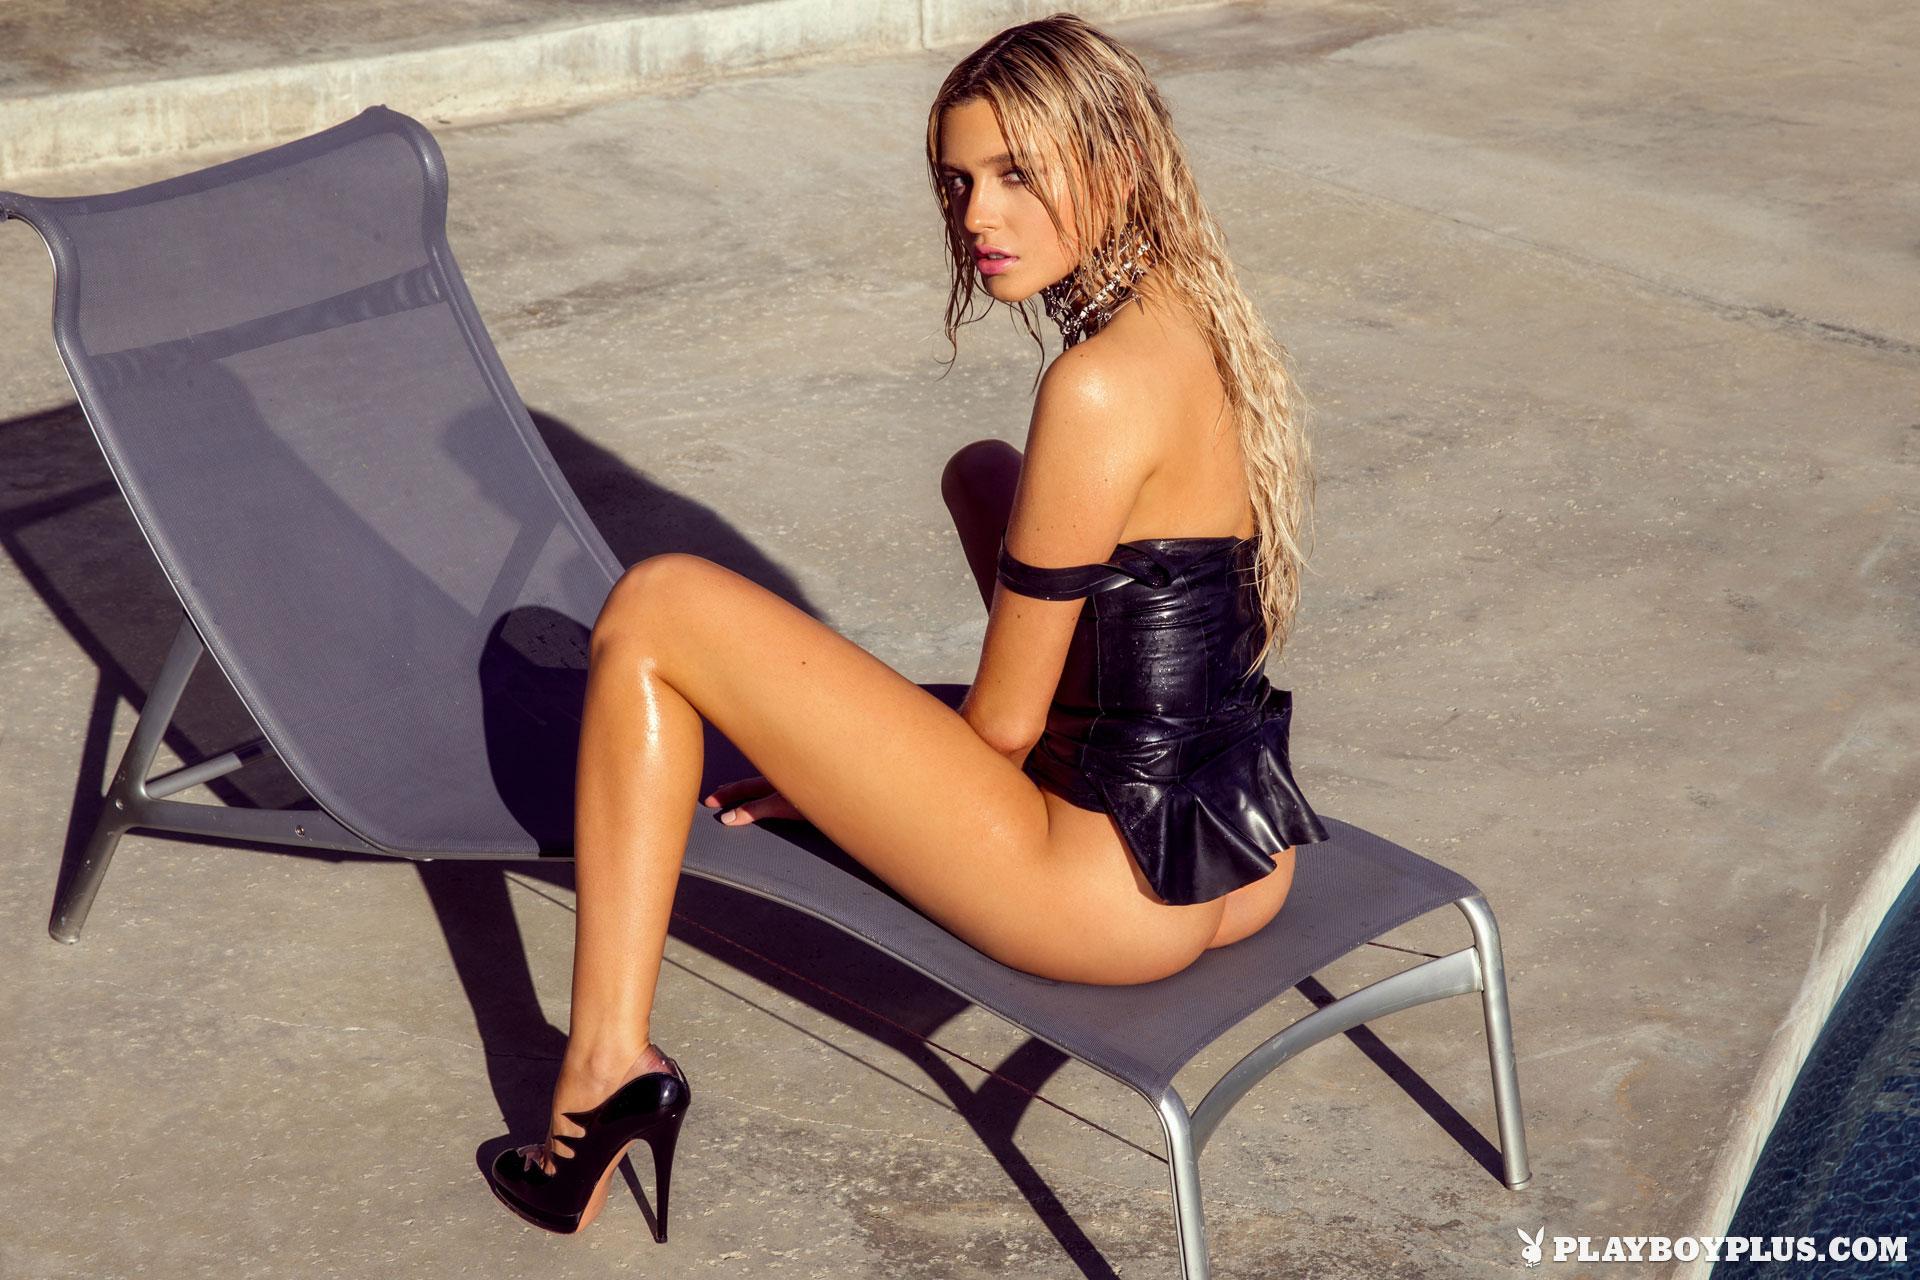 monica-sims-pool-naked-playboy-02